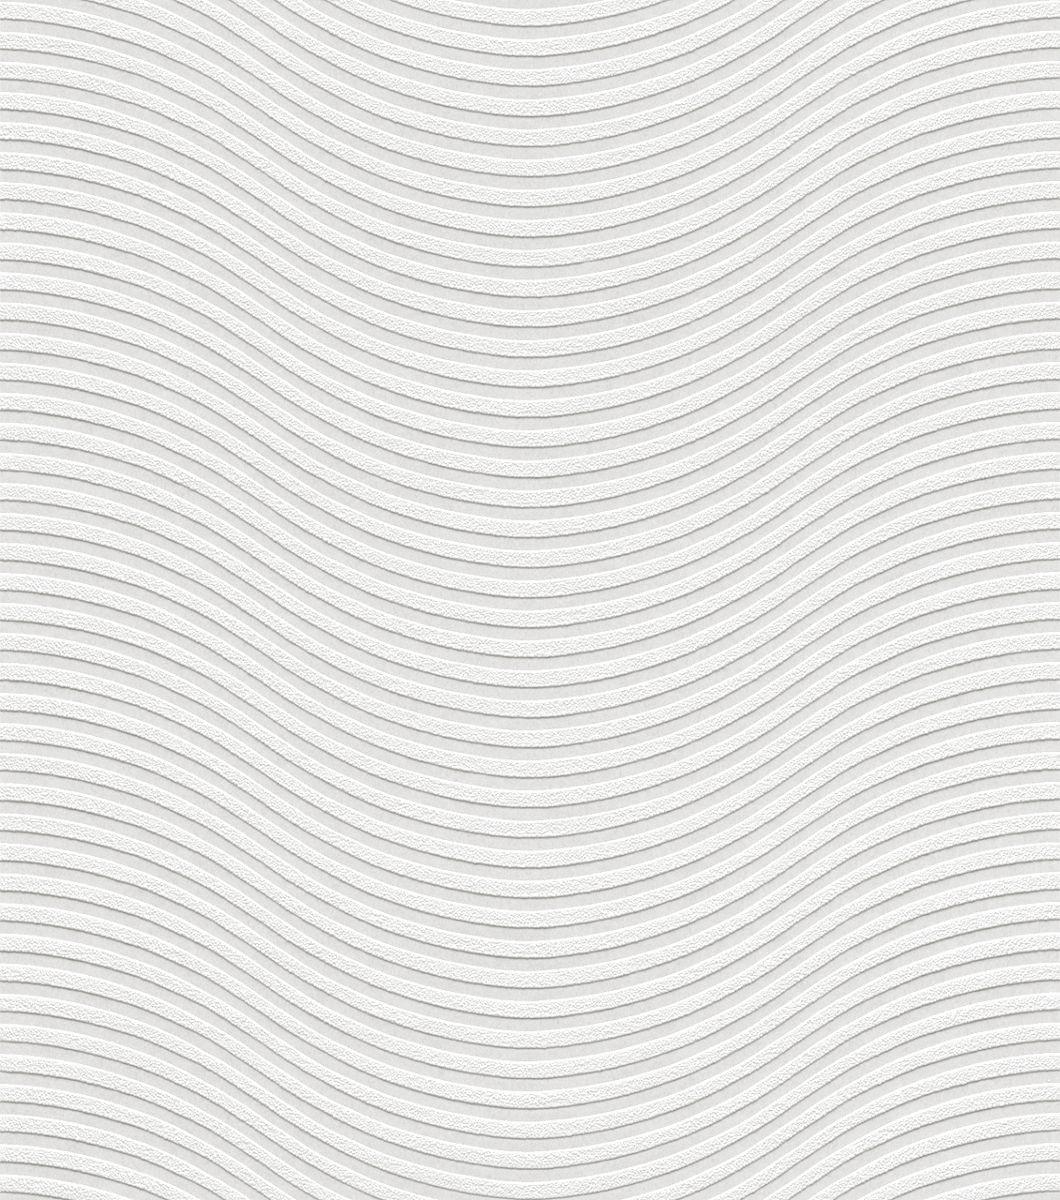 Vlies Tapete Uberstreichbar Welle Maritim Rasch 162806